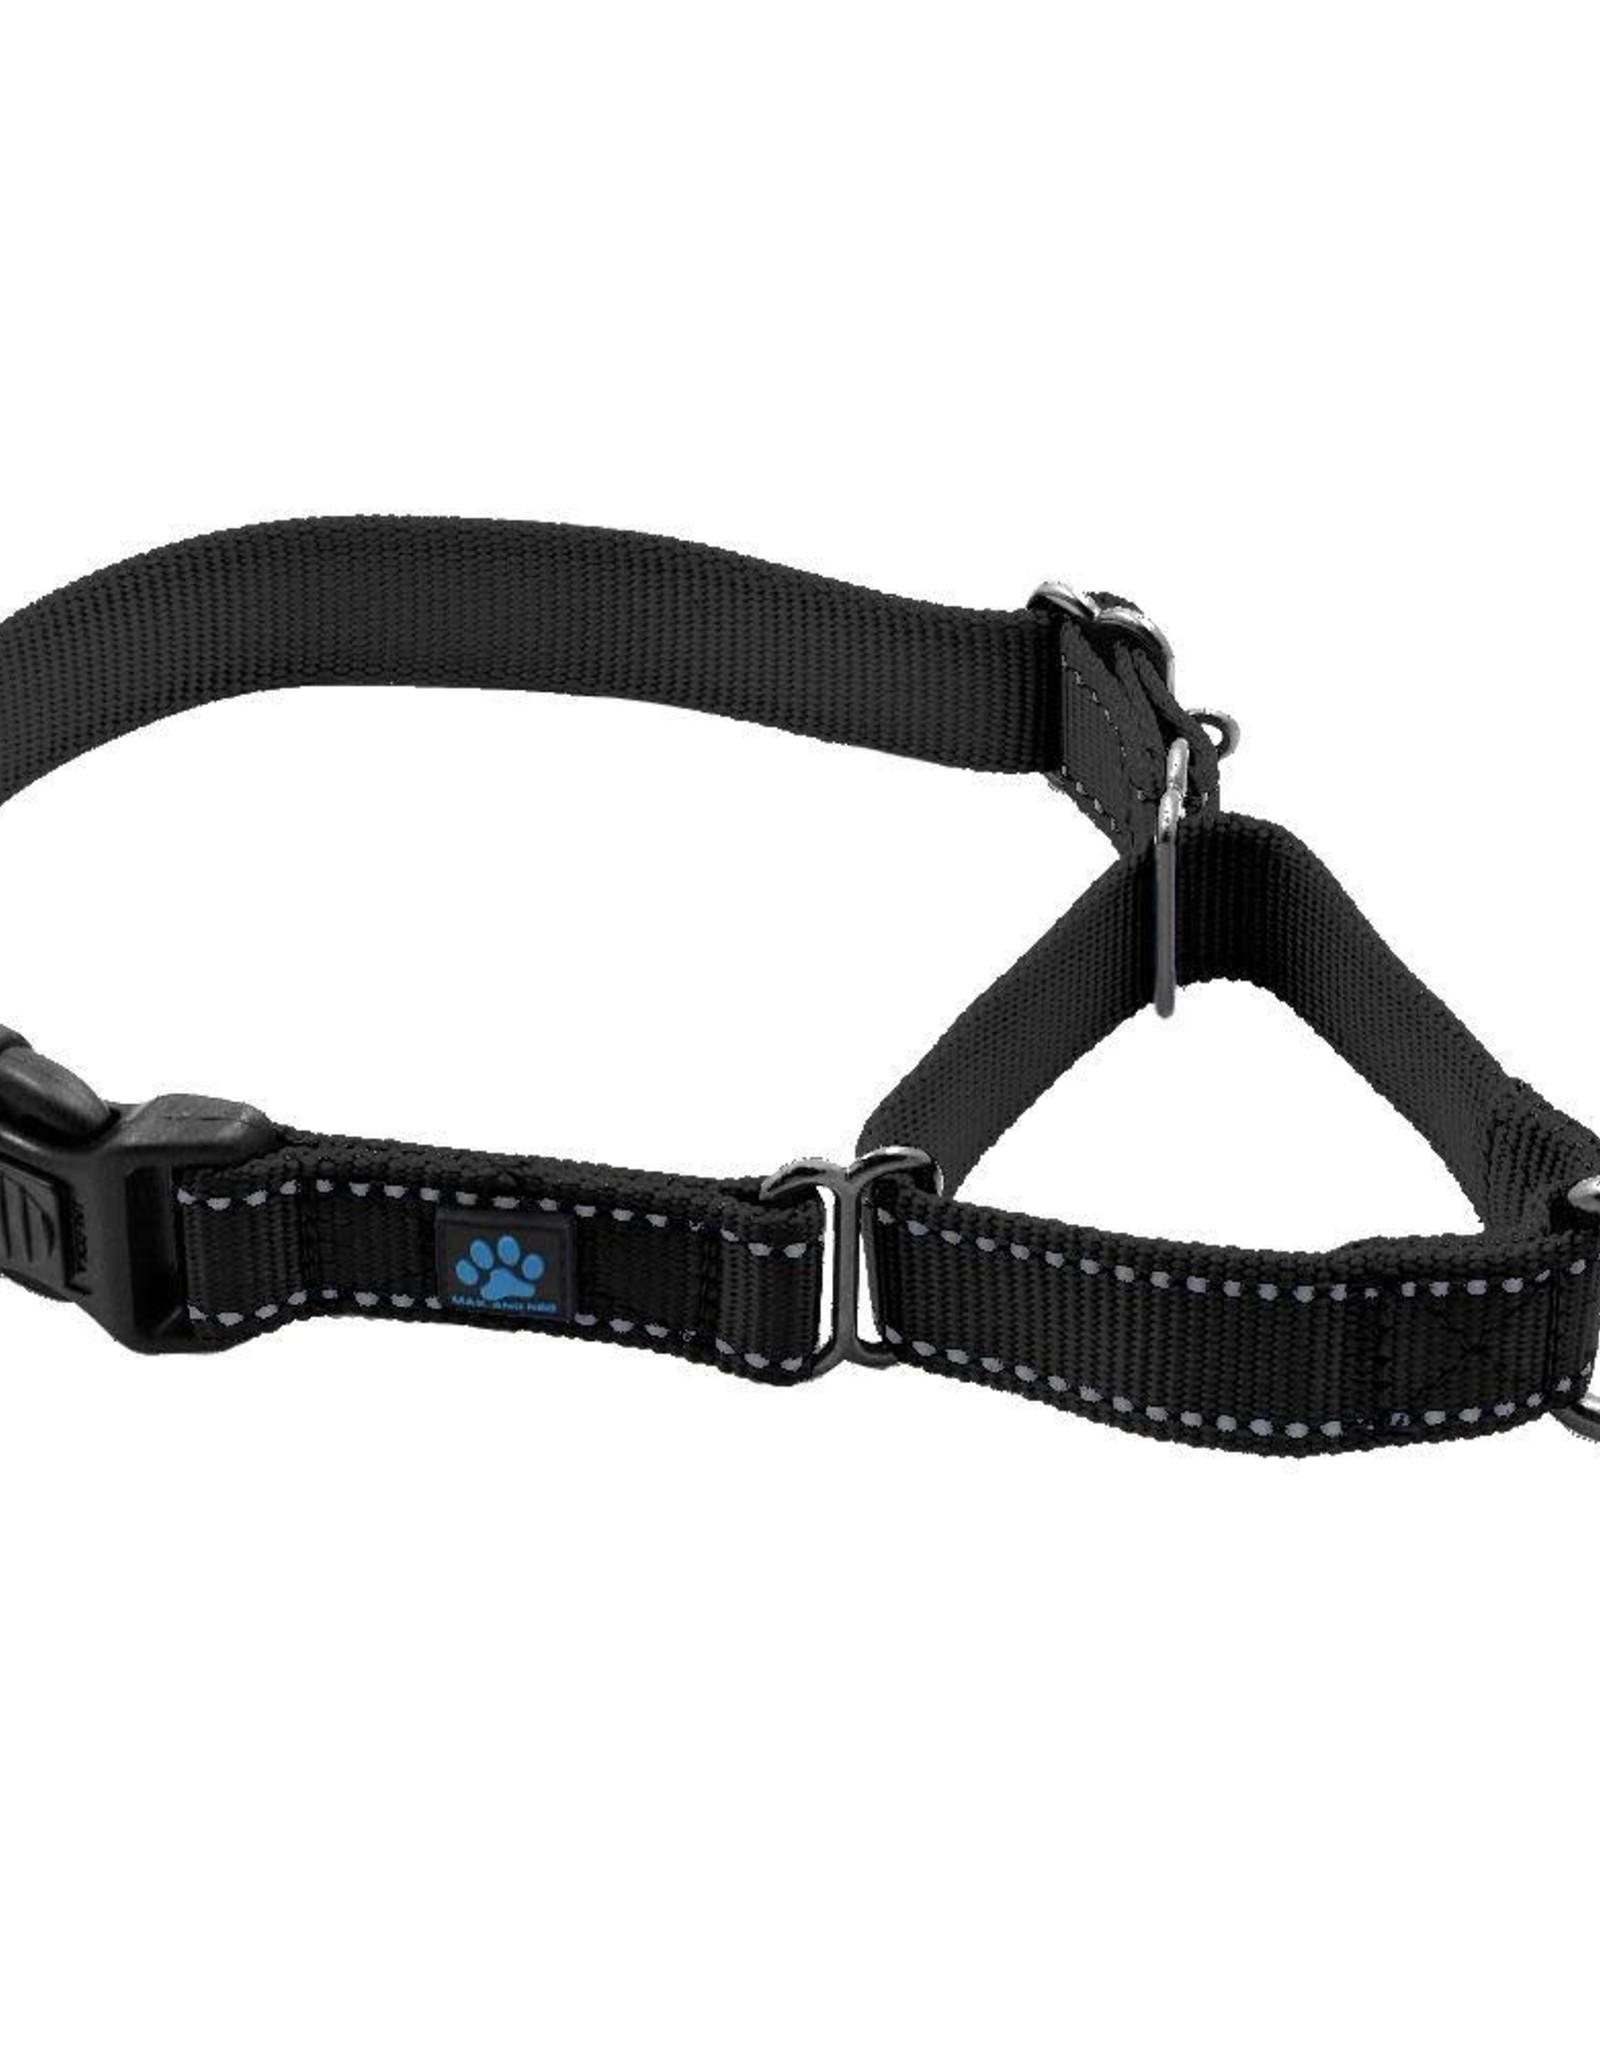 Max & Neo Max & Neo Collars - Large Black Martingale